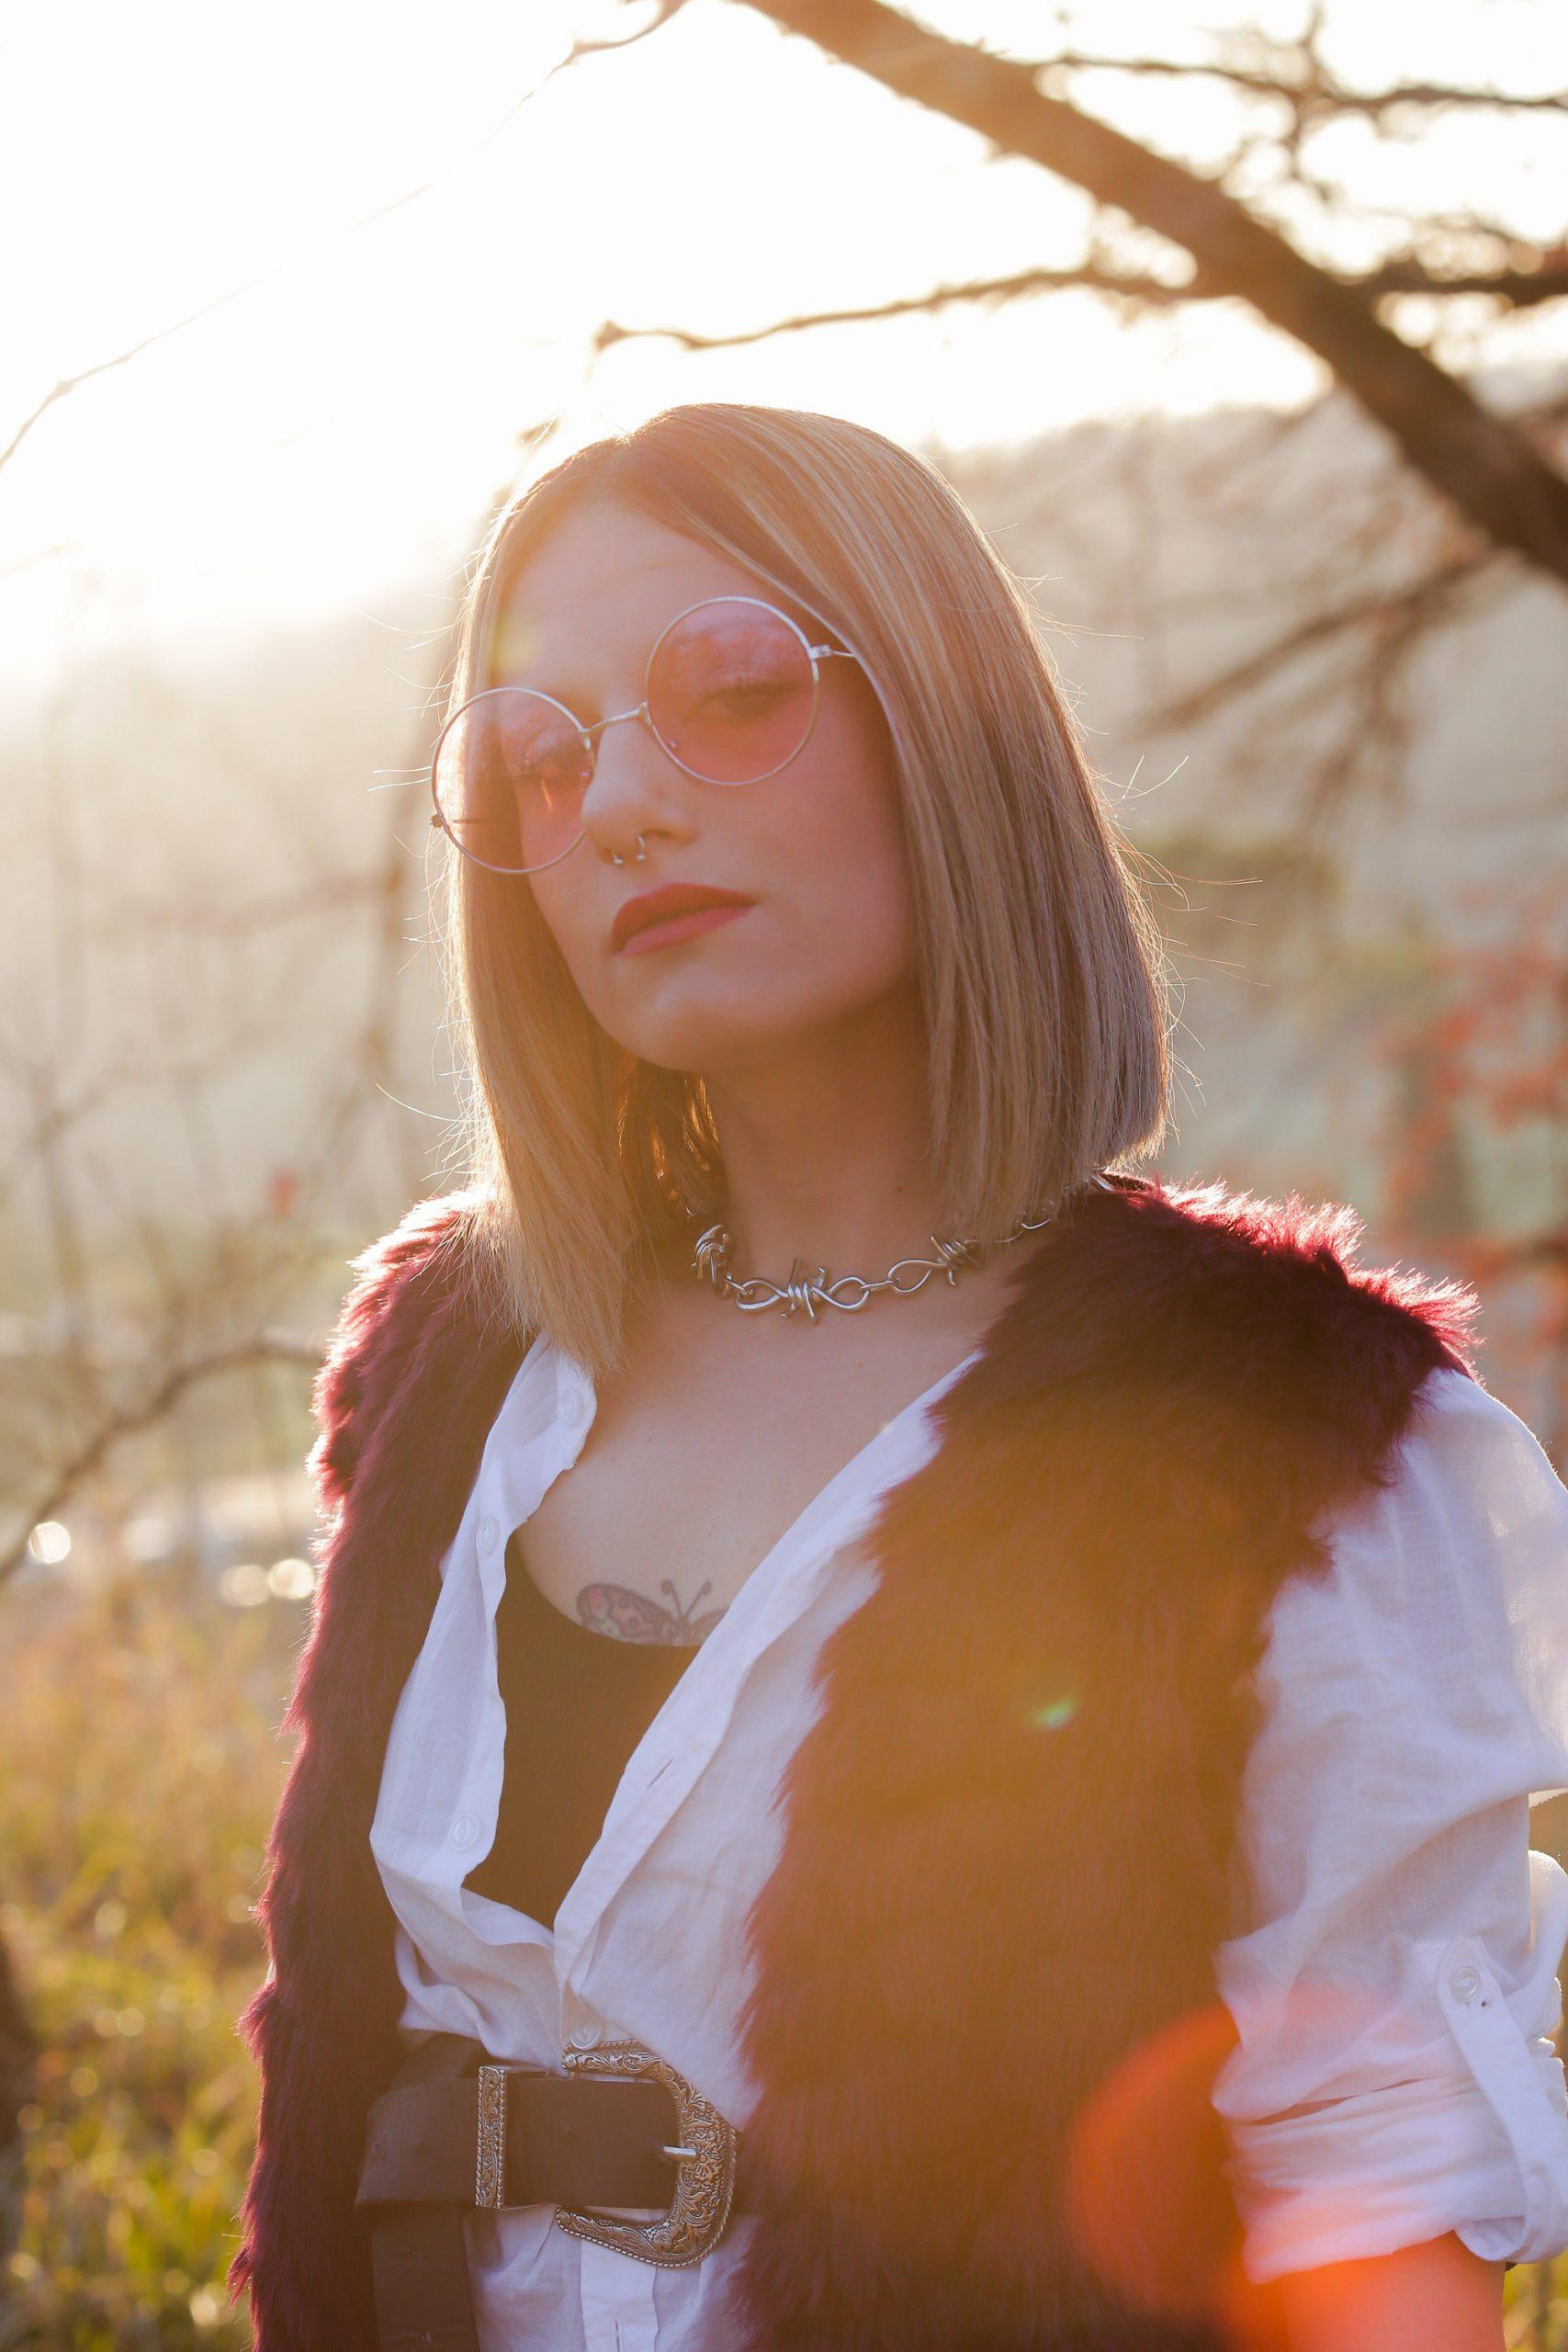 Categorie: Fashion, Glamour, Portrait; Photographer: SARA GENTILI; Models: ELEONORA PINARDI, SABRINA BARTOLUCCI, NICOLE GIANNINI, MARZIA MALIZZI; Location: Roma, RM, Italia